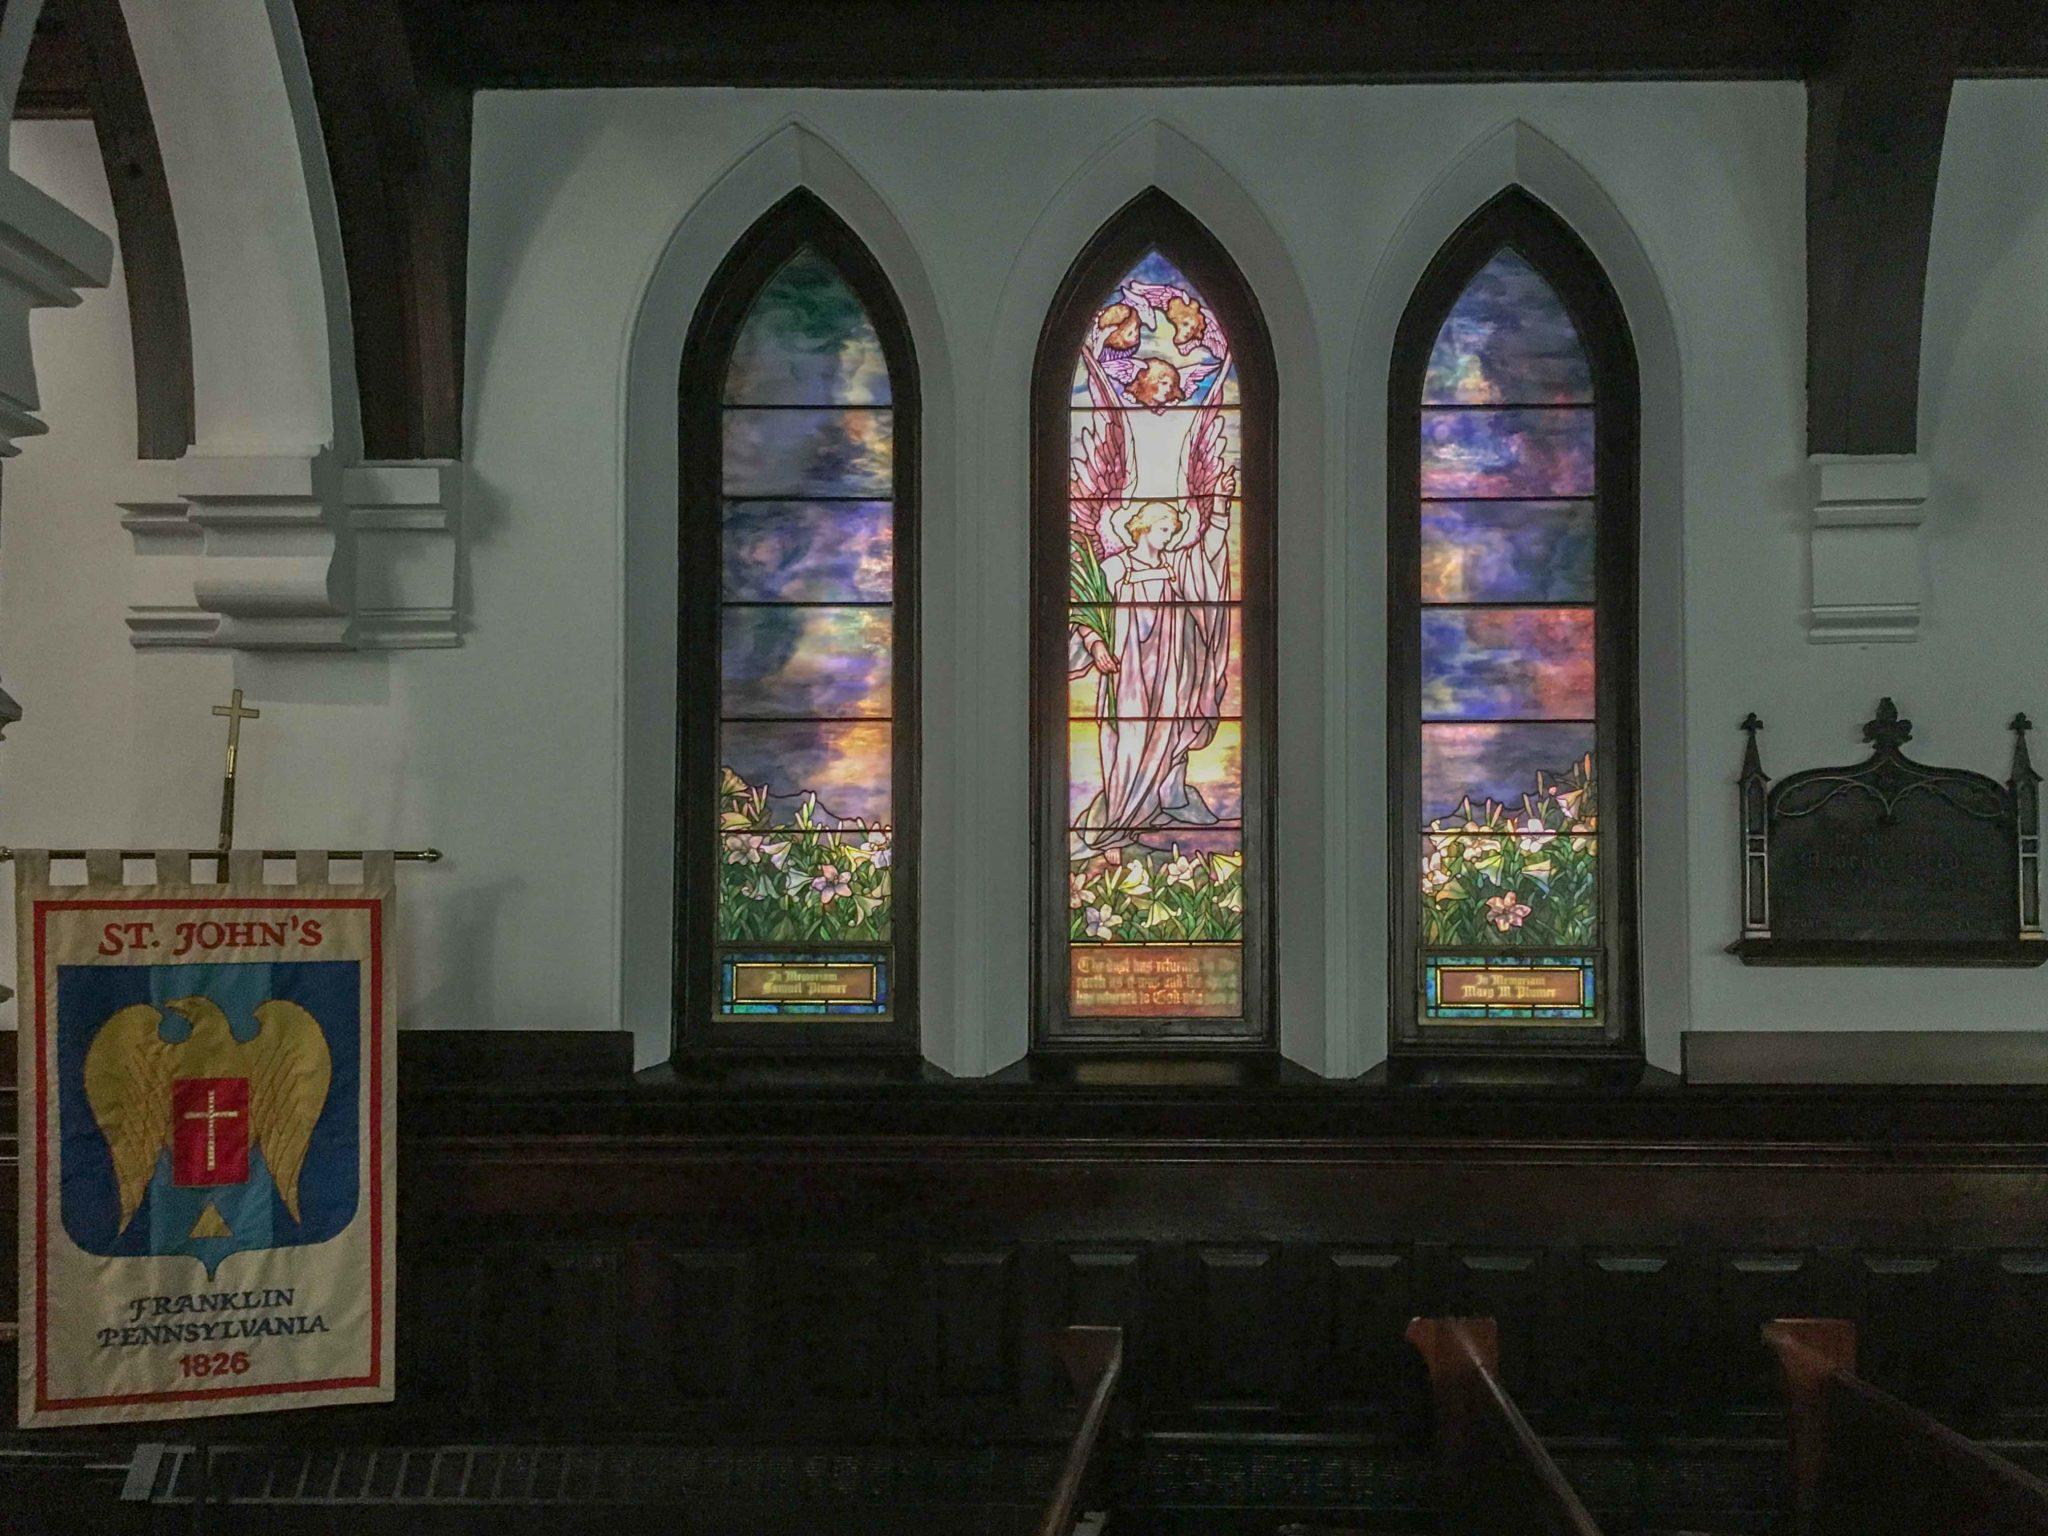 Tiffany window in Franklin Pennsylvania